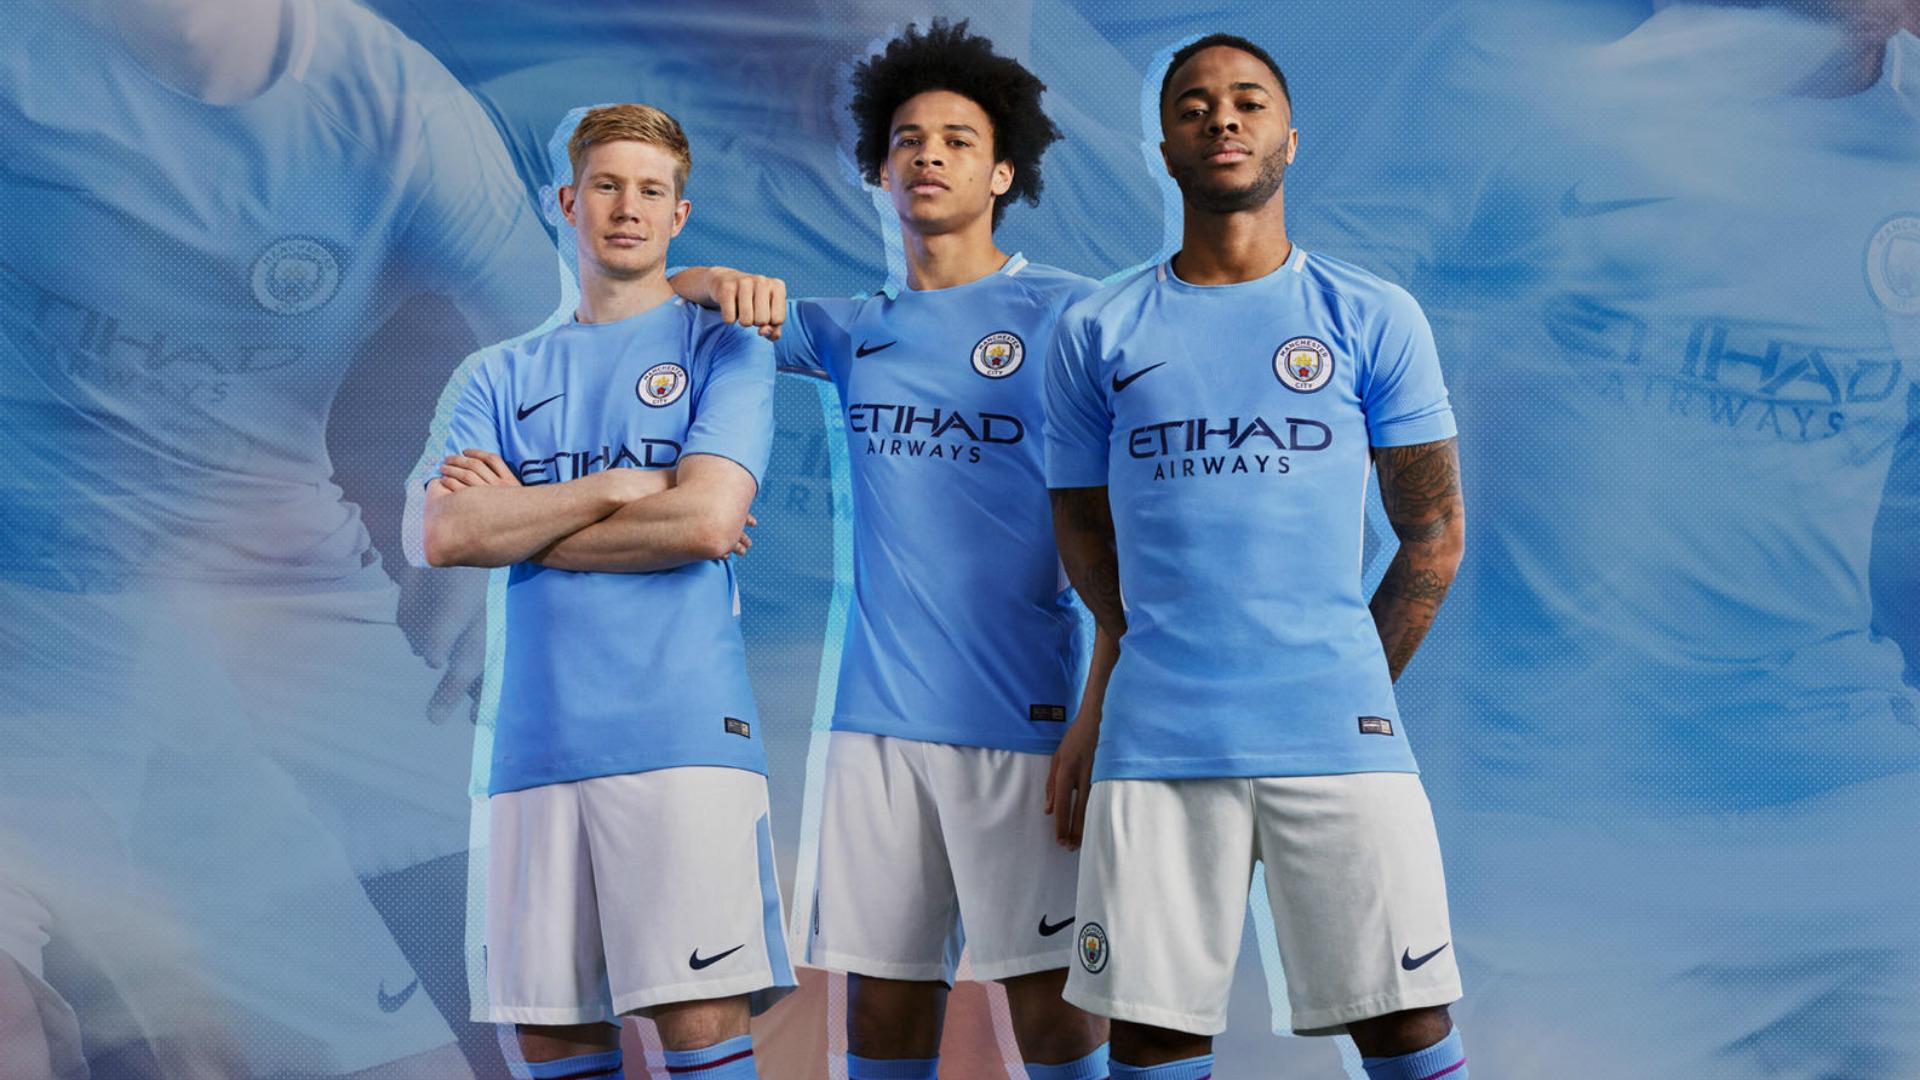 Manchester City New Home Kit 2017-18